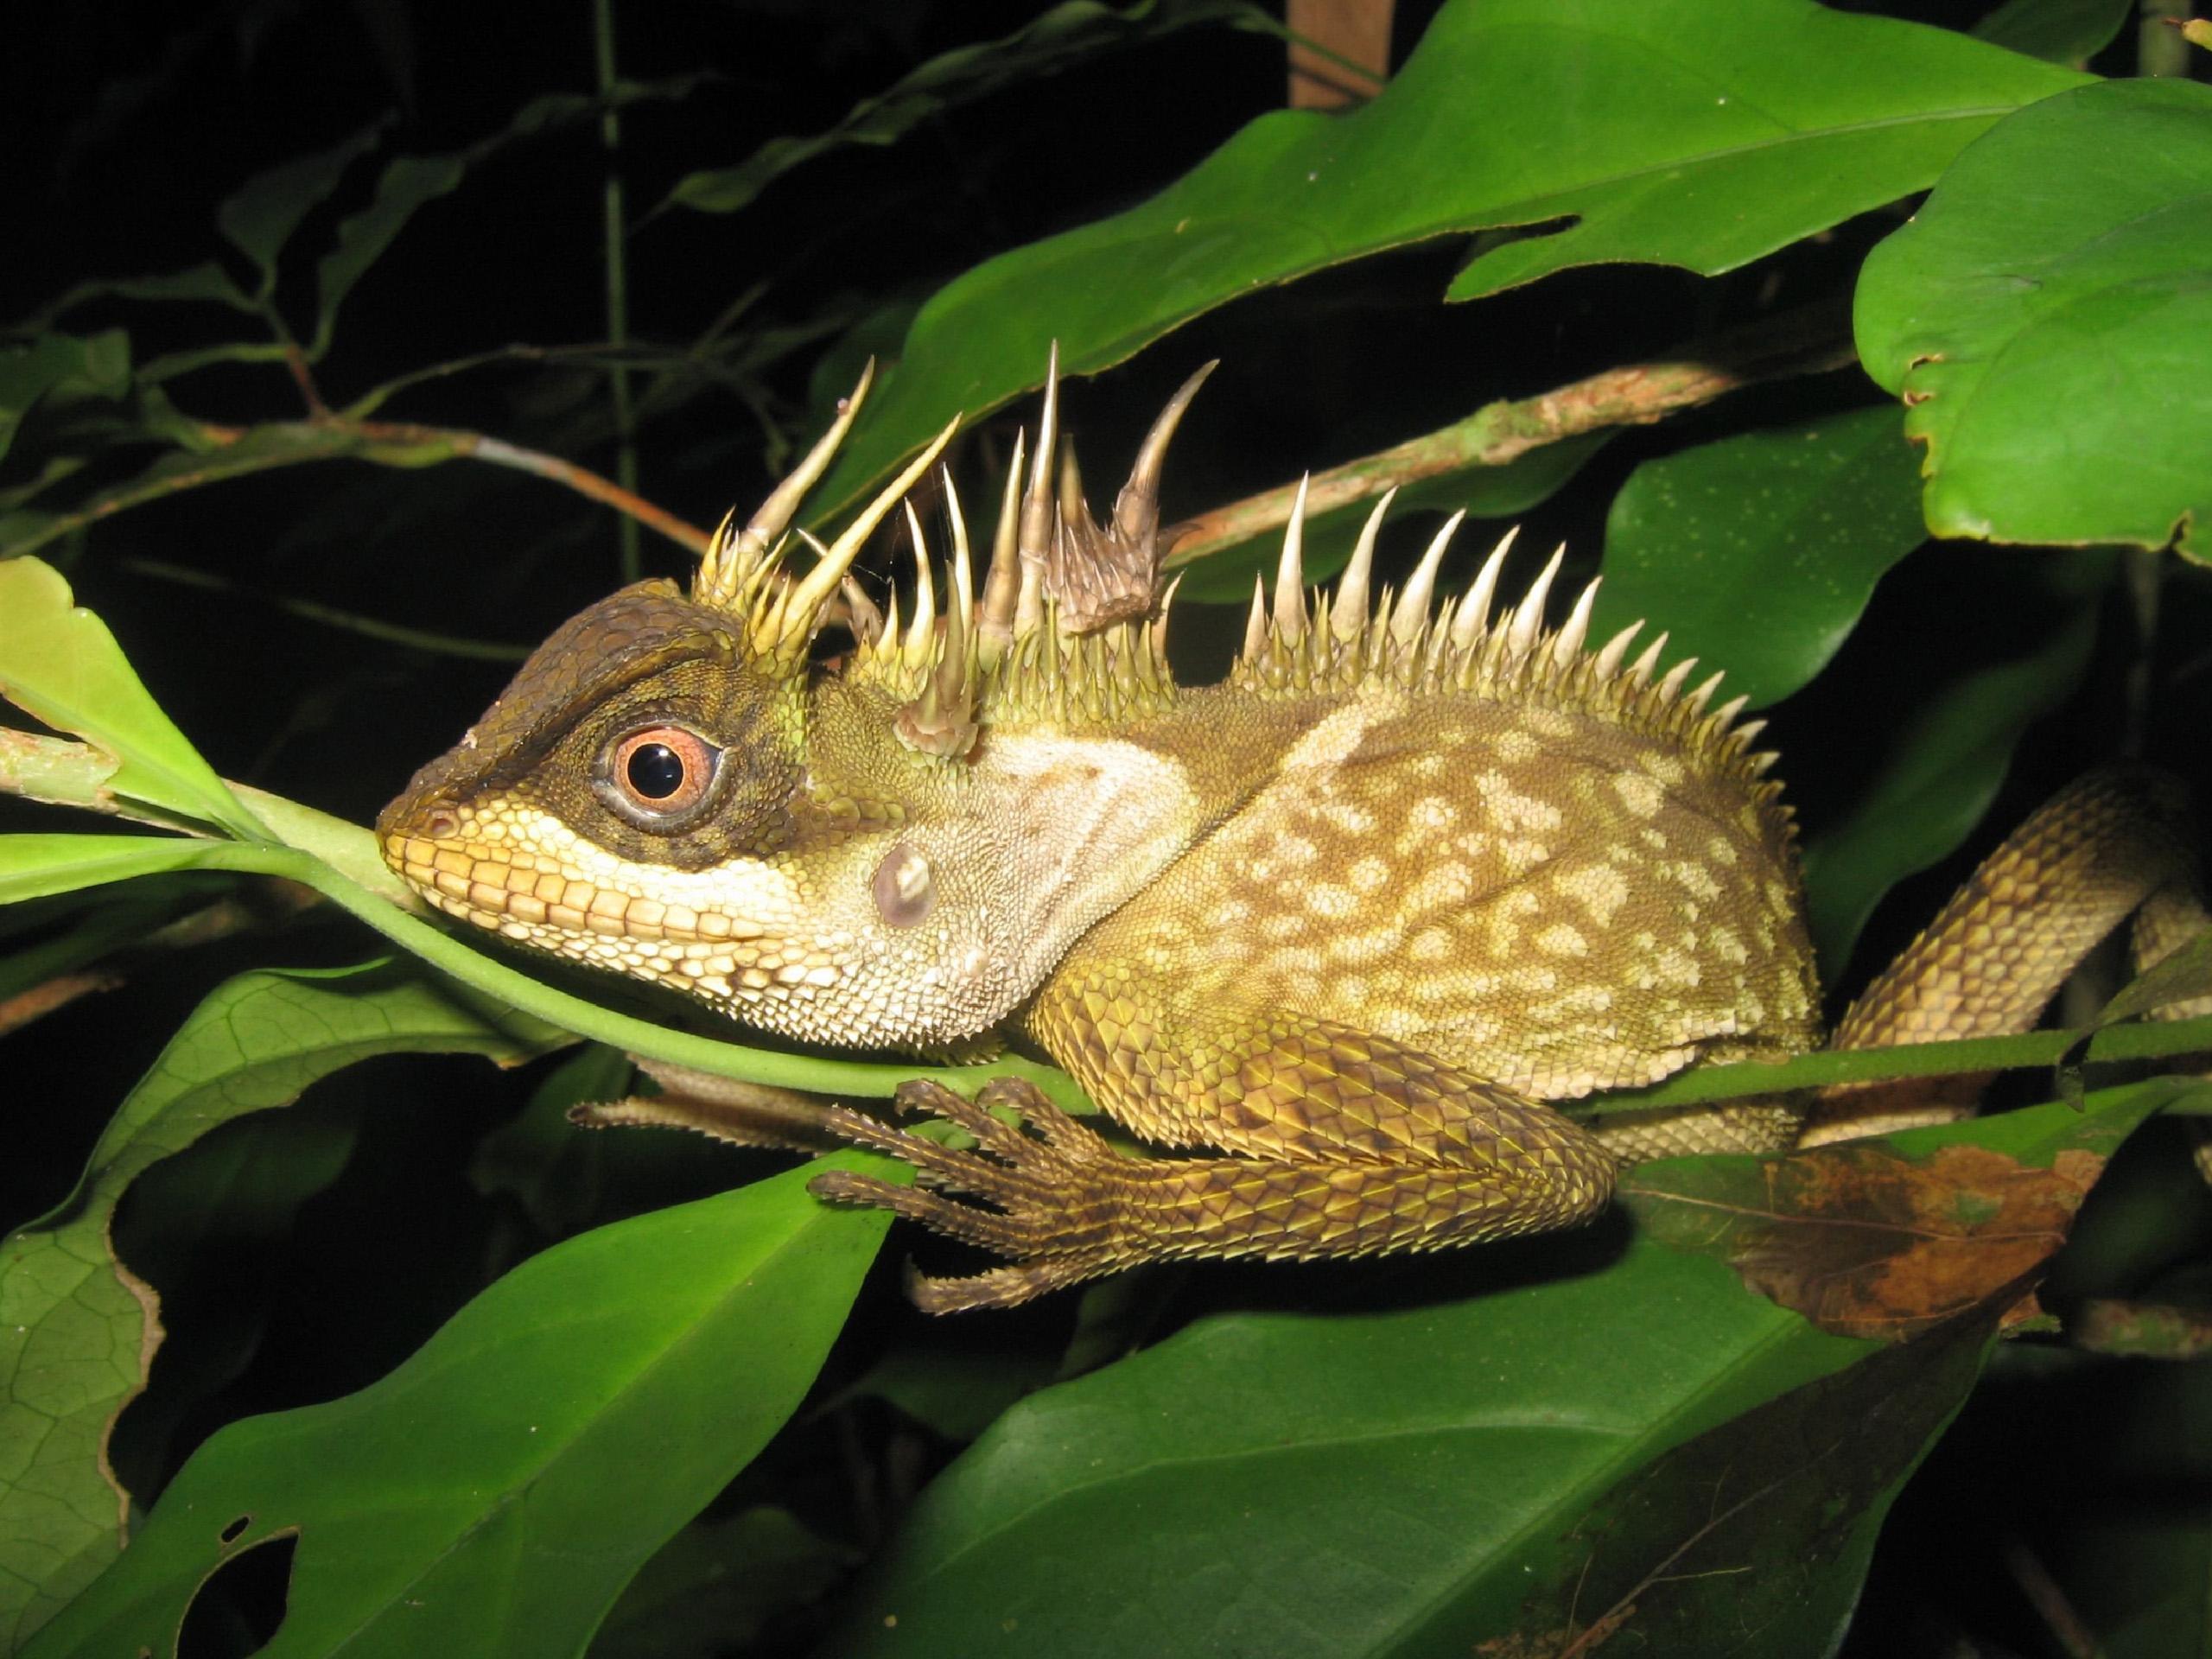 THAILAND-SEASIA-ANIMAL-SCIENCE-CONSERVATION